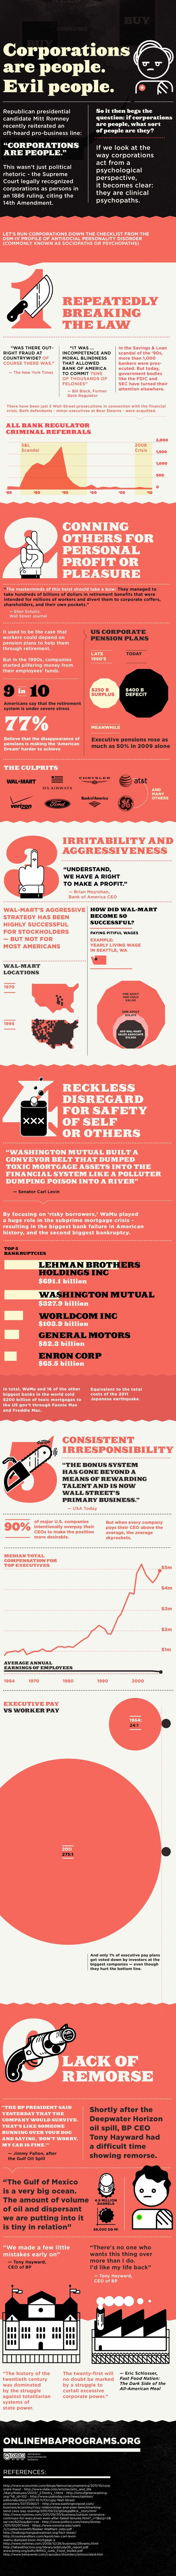 Corporations Are Sociopaths